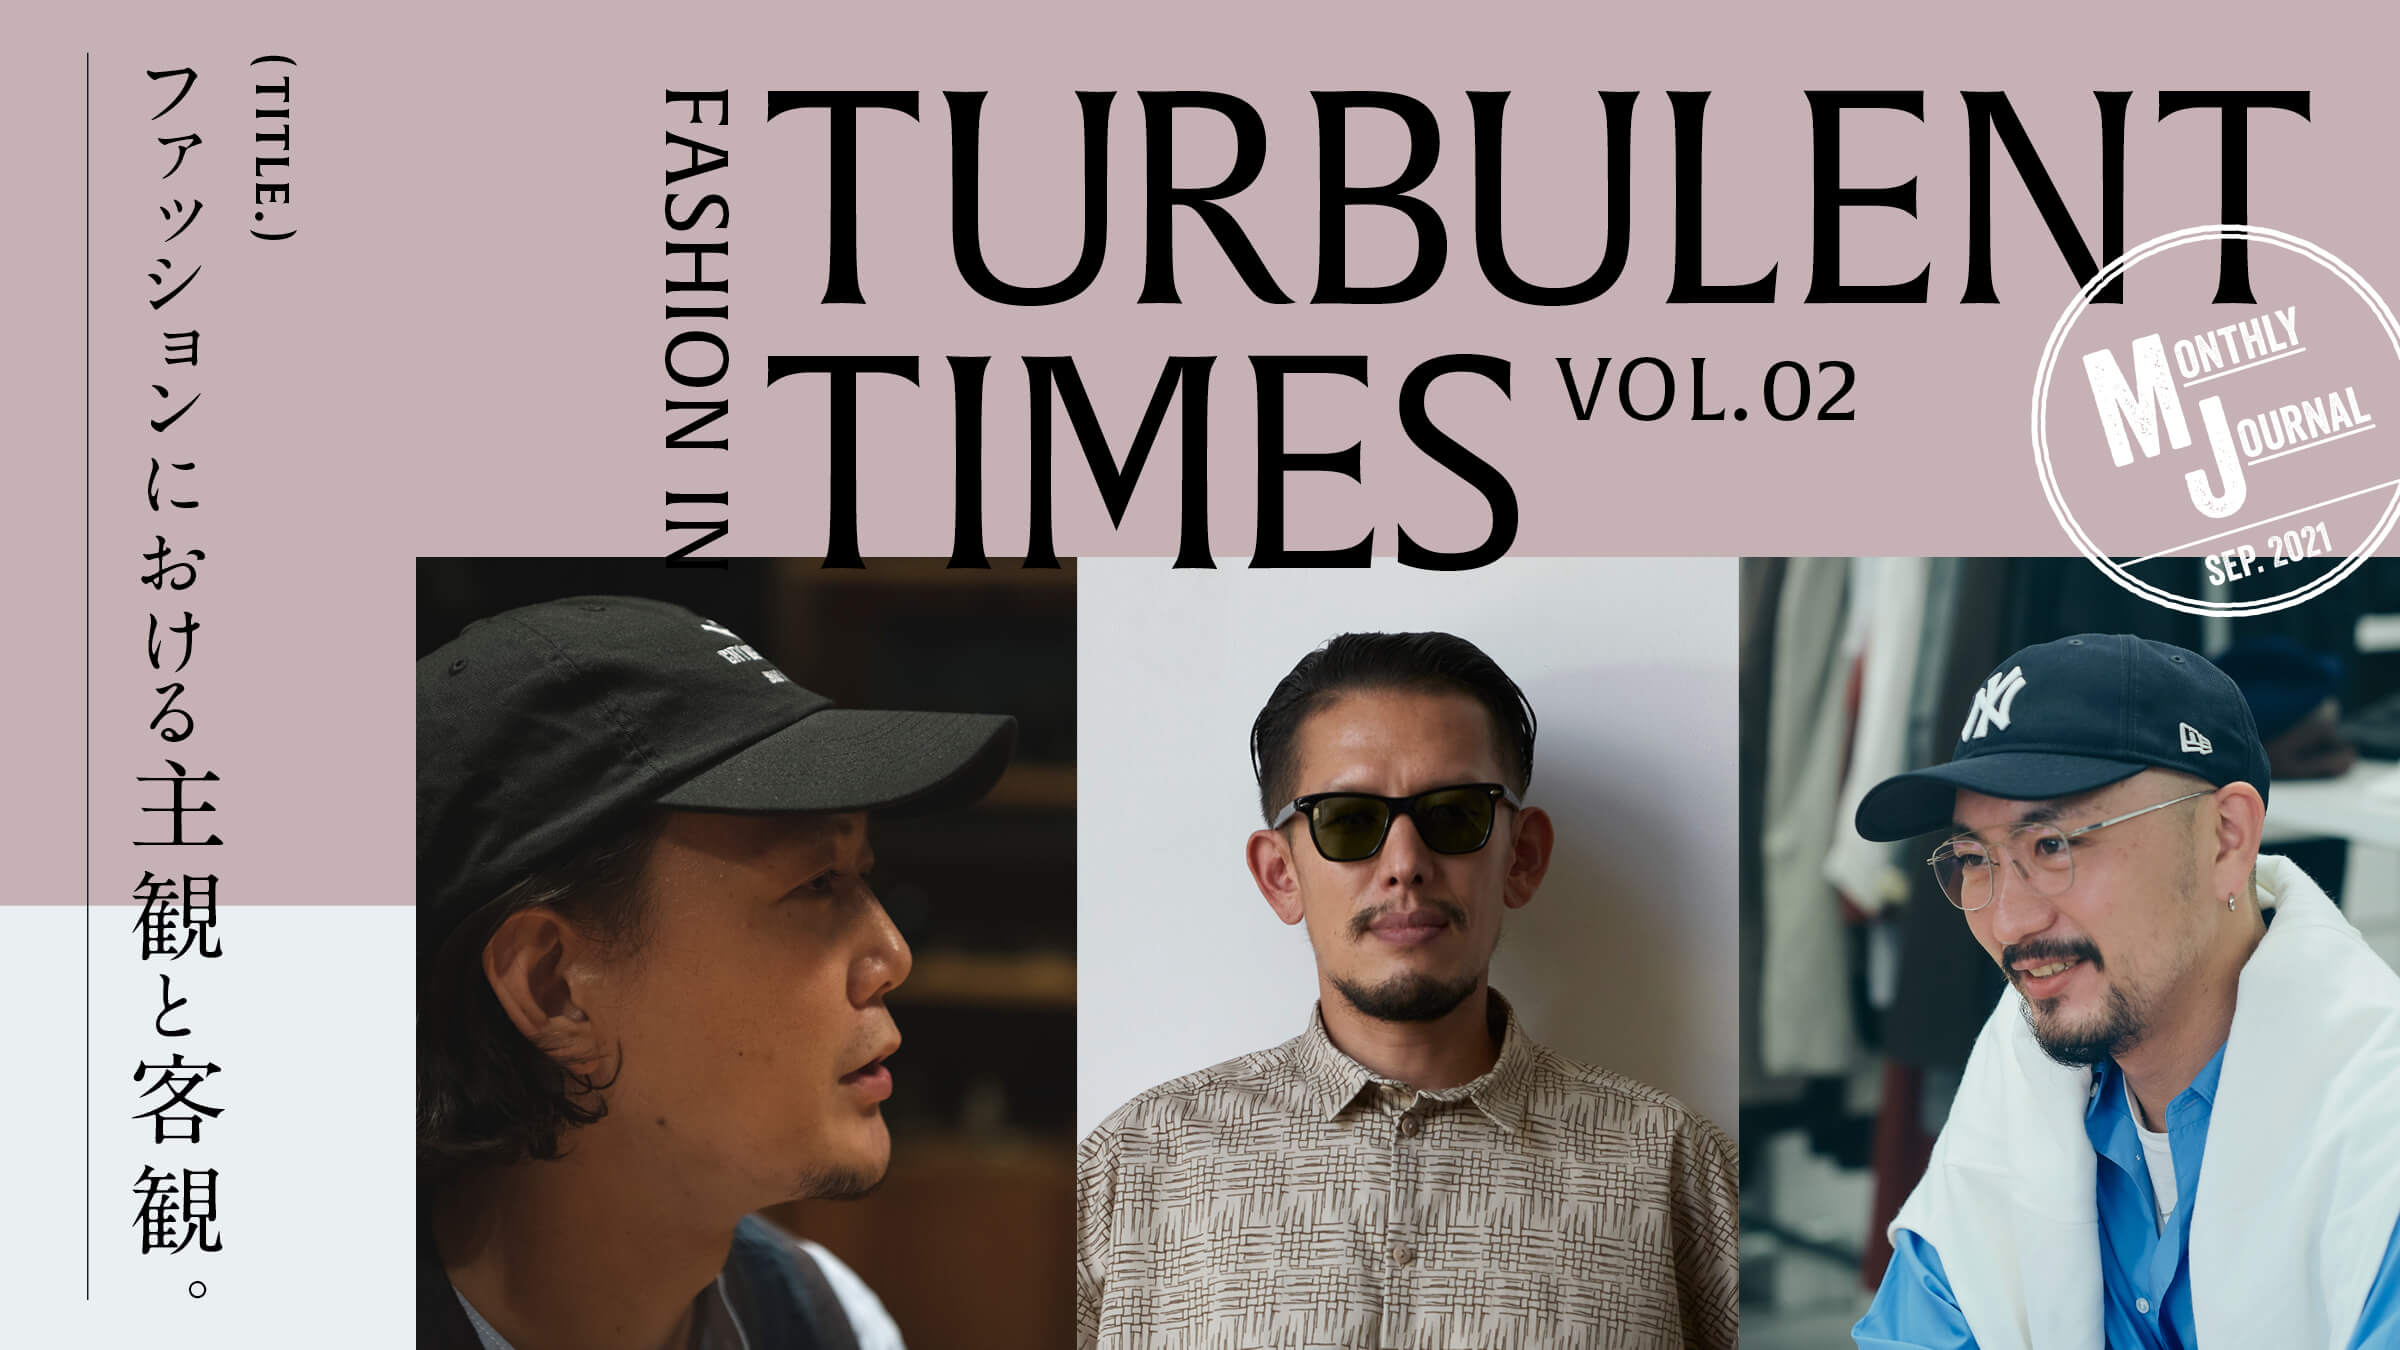 FASHION IN TURBULENT TIMESファッションにおける主観と客観。VOL.02